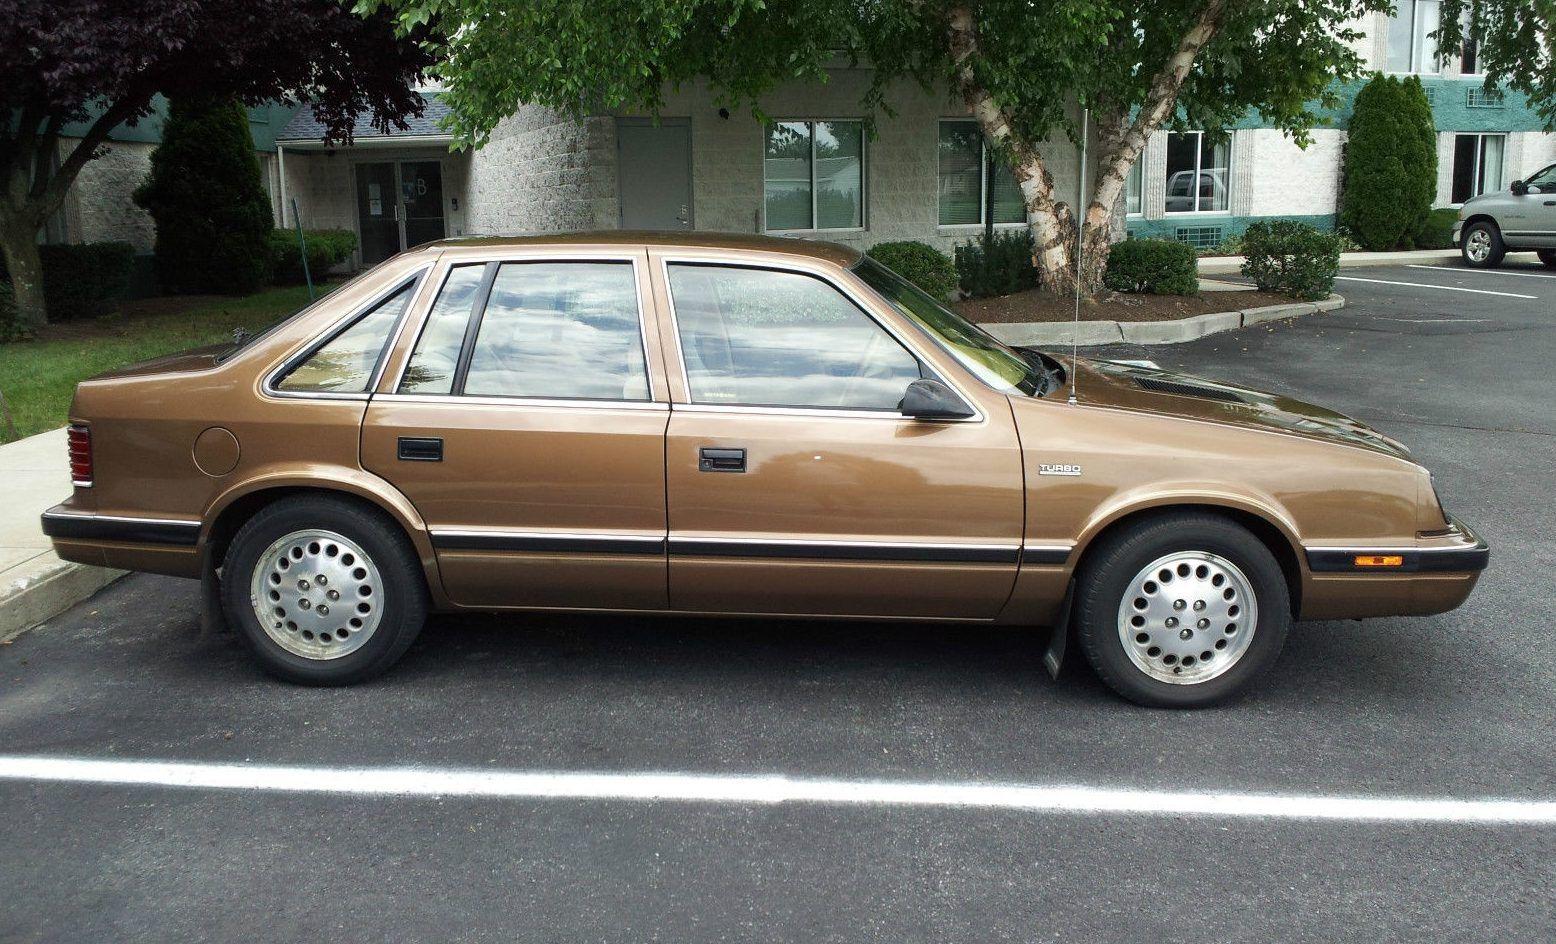 Grandma Owned 1986 Chrysler LeBaron GTS Barn Finds